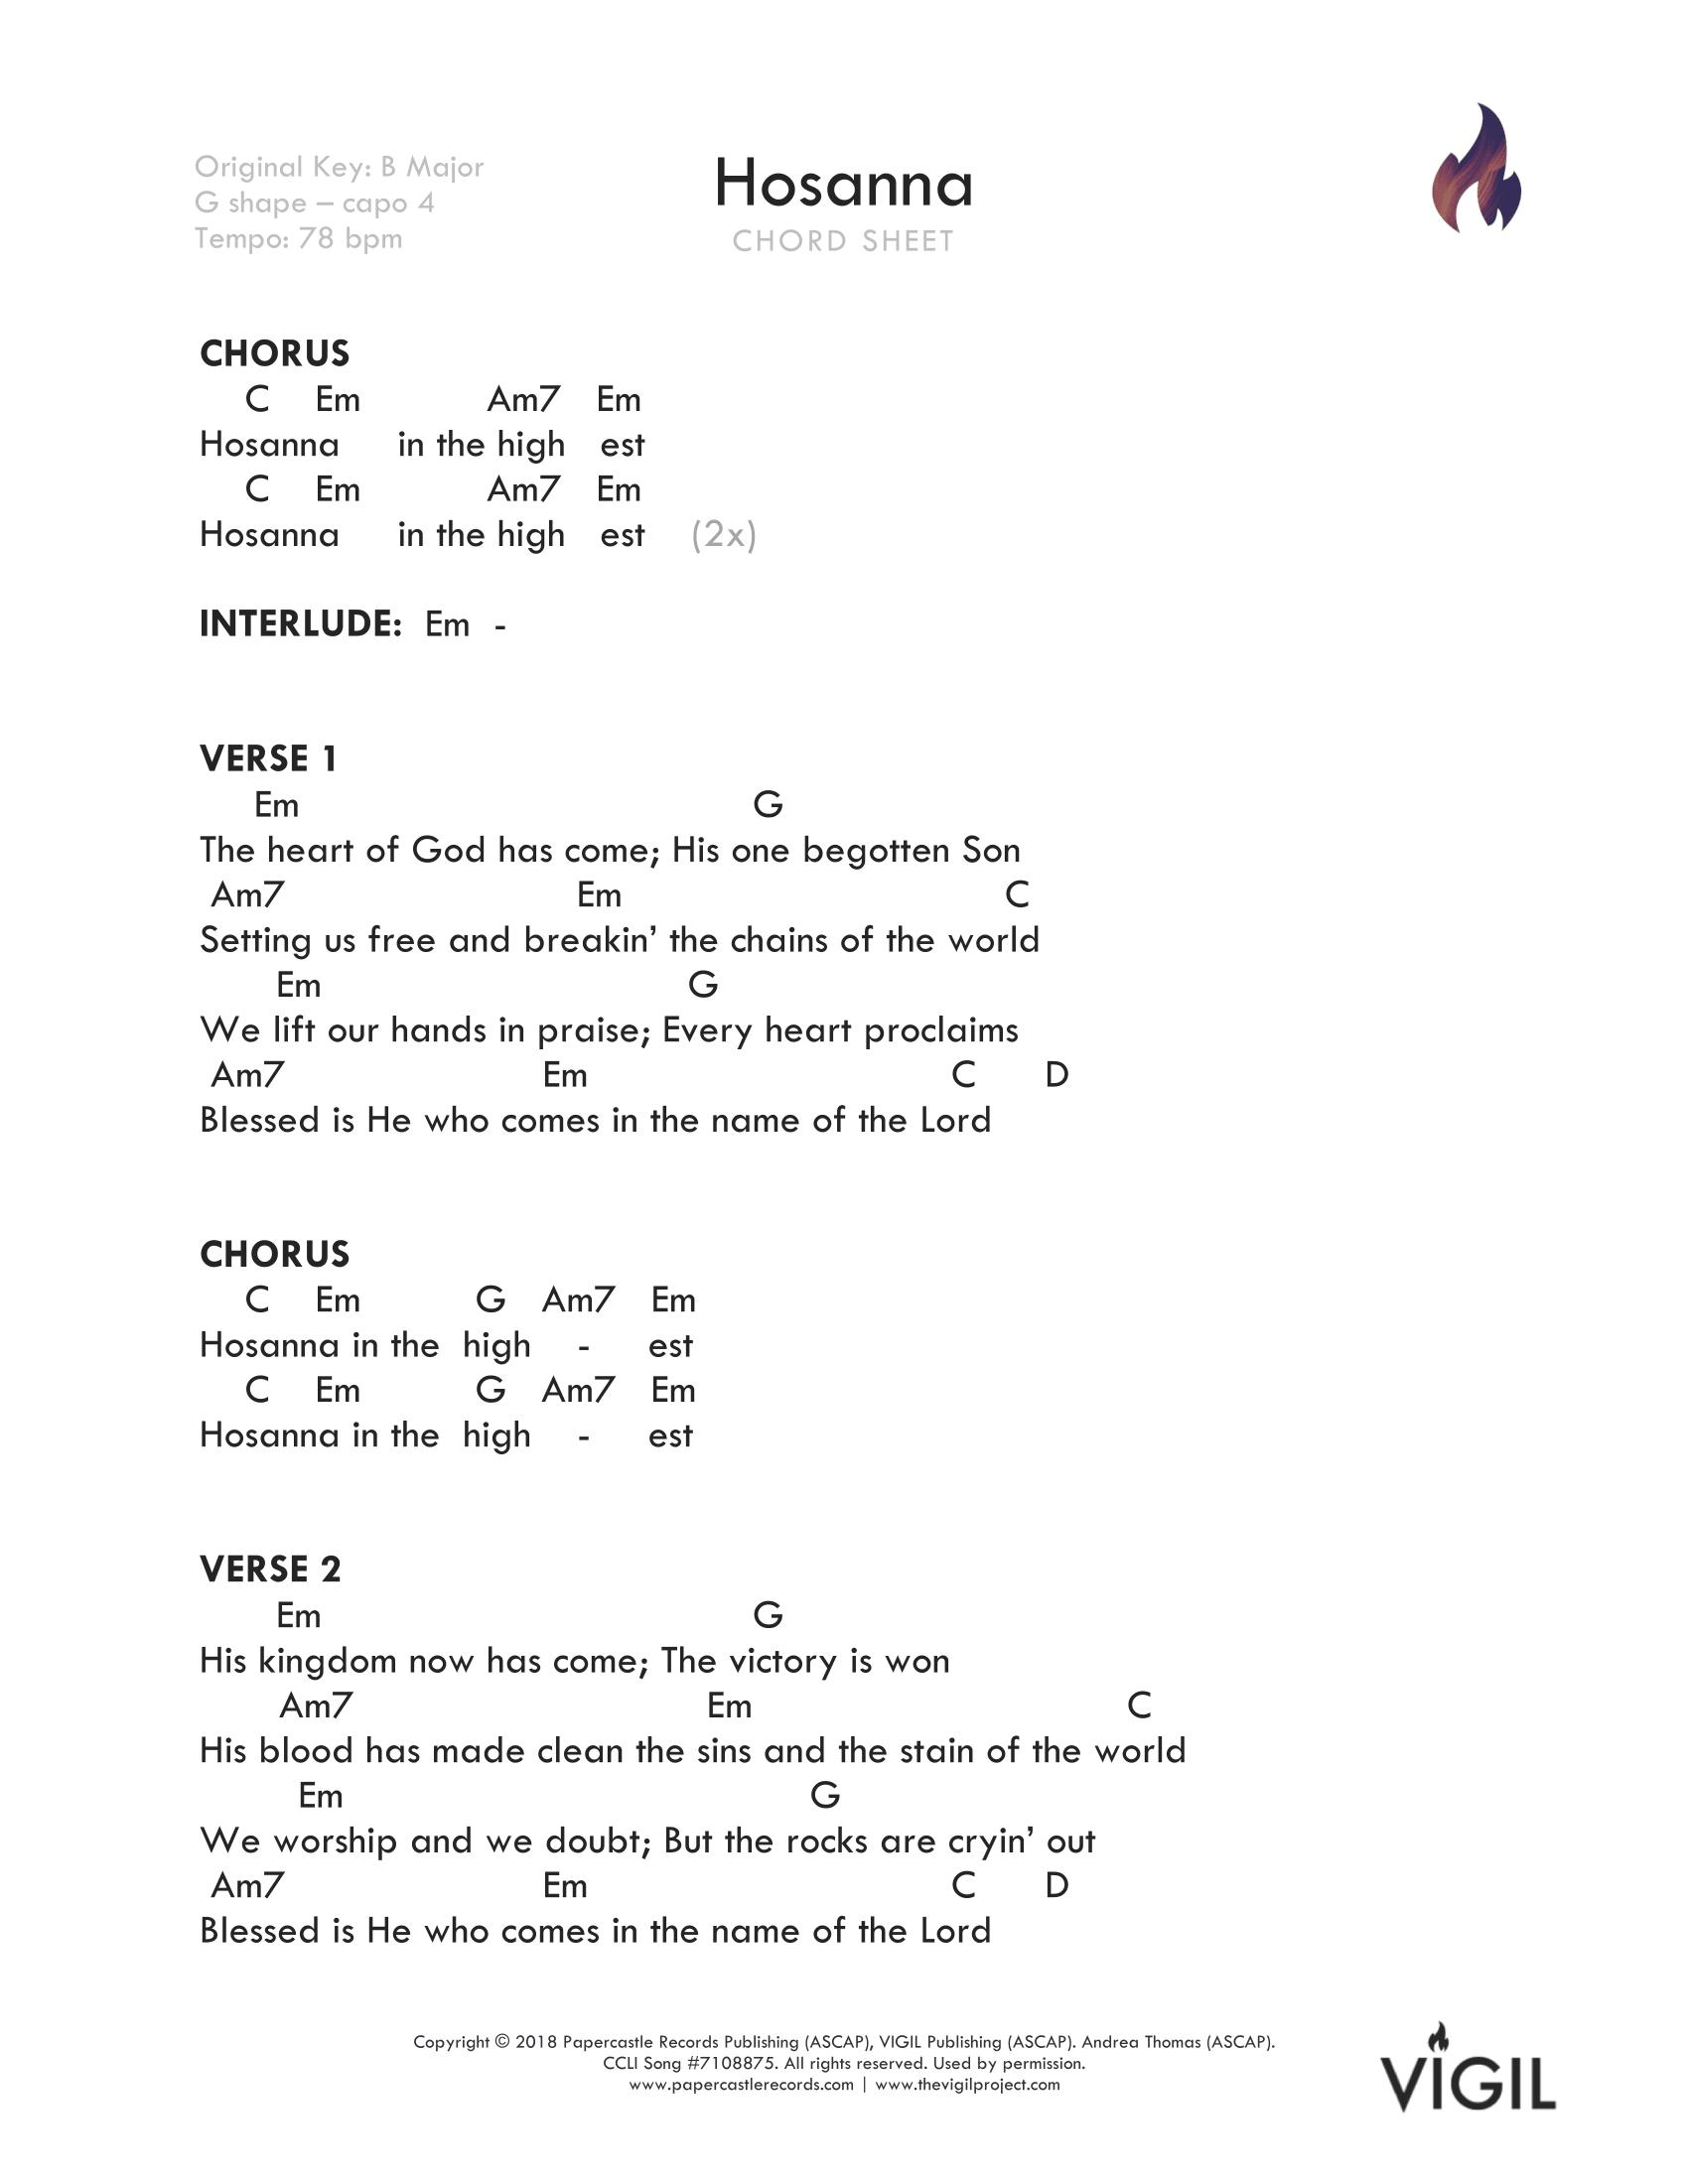 Hosanna-CHORD+SHEET+(G+Major)-1.png